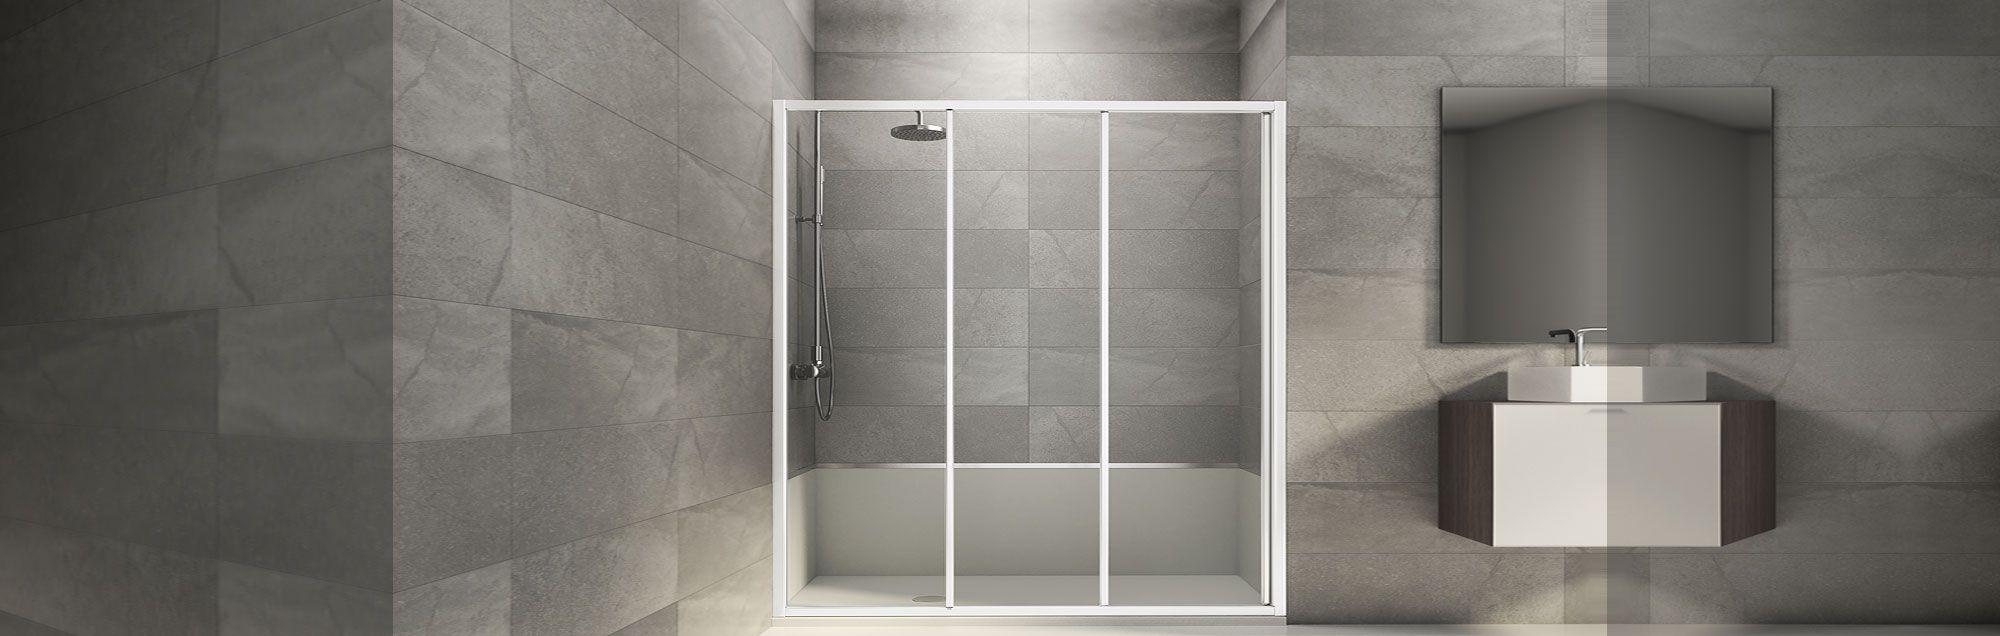 Serie de mamparas standard de baño a medida